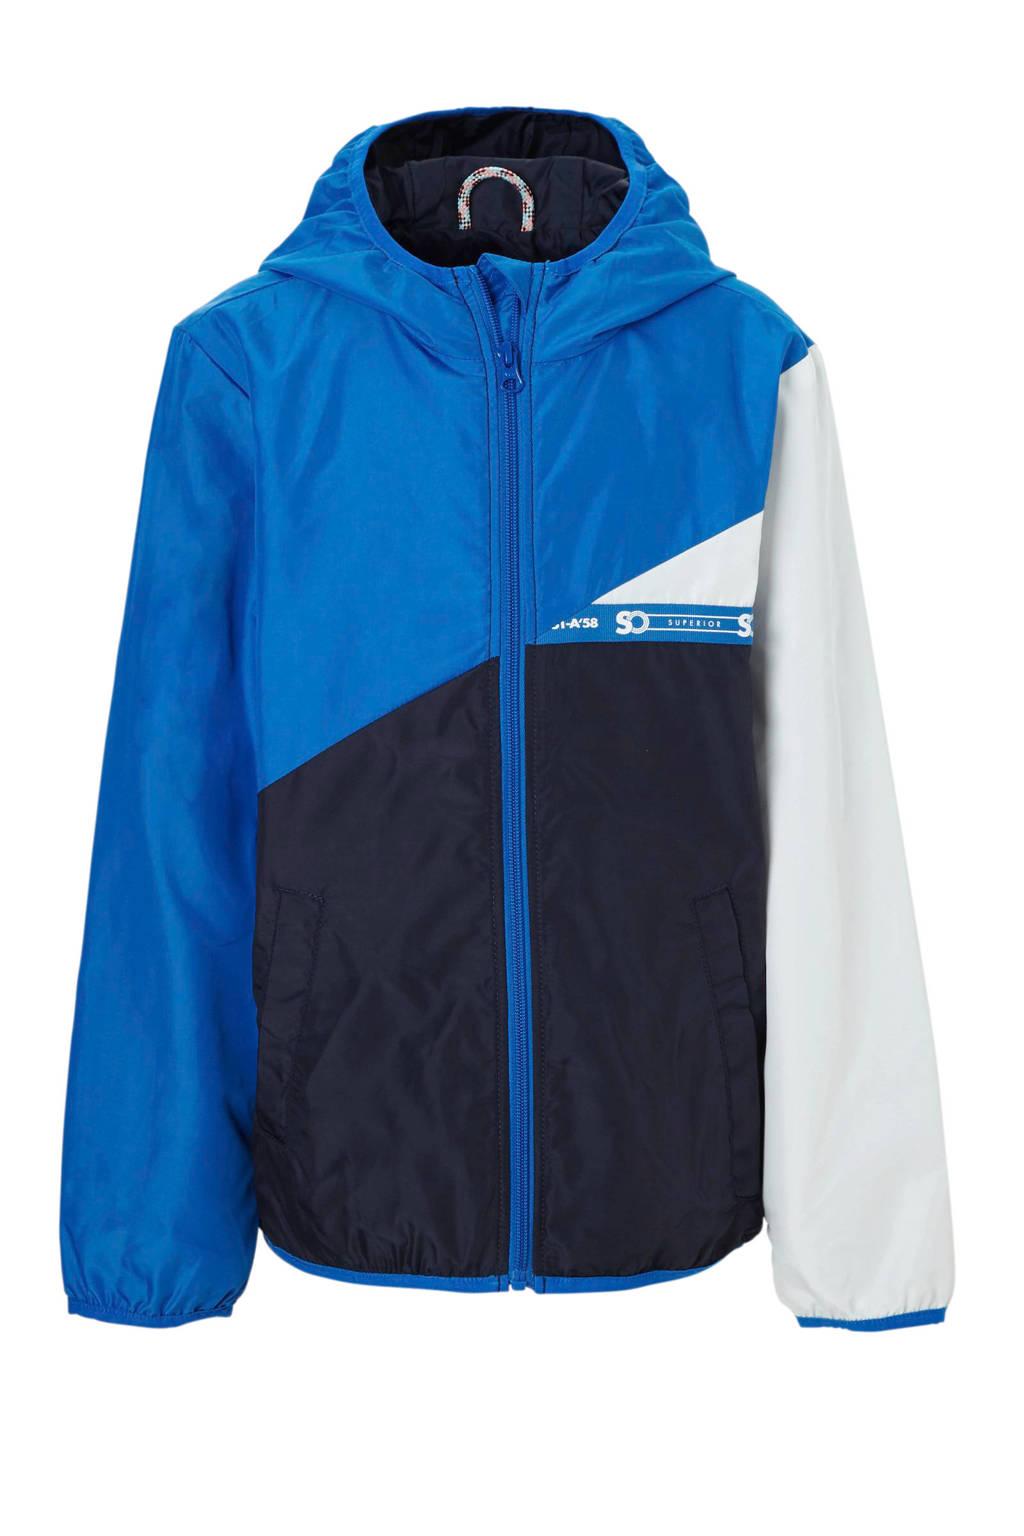 s.Oliver zomerjas met capuchon blauw, Blauw/donkerblauw/wit